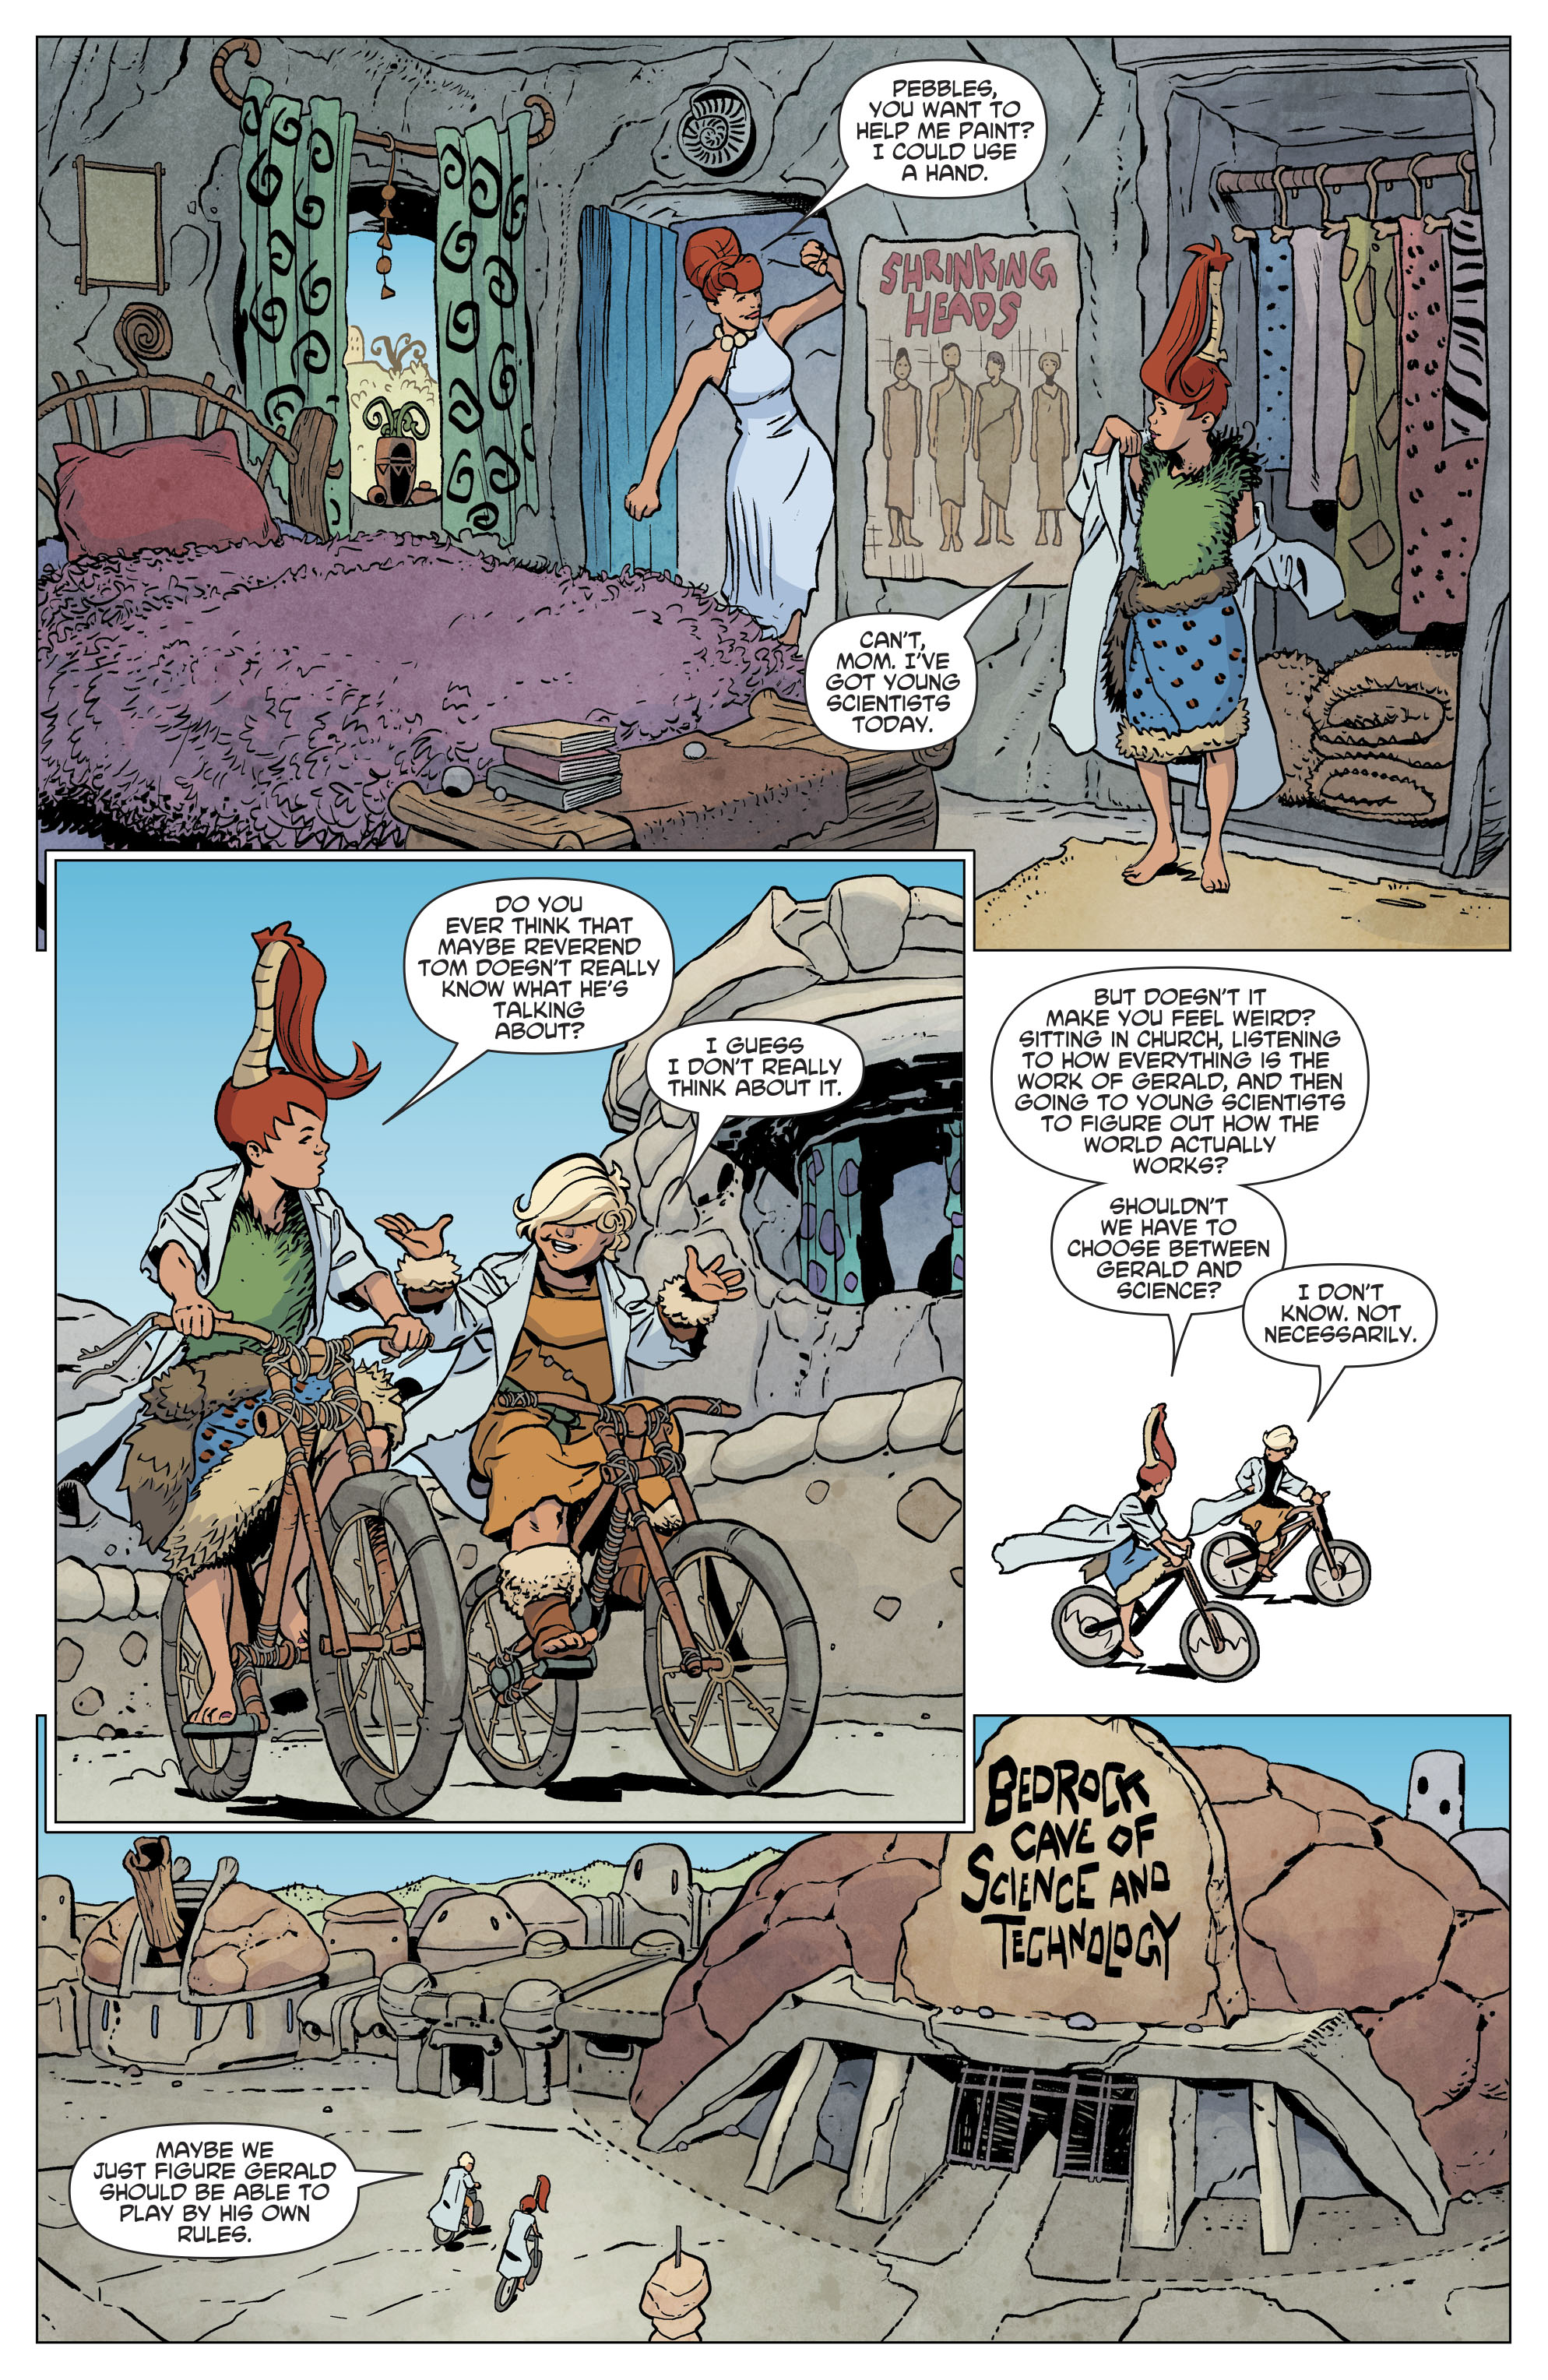 Read online The Flintstones comic -  Issue #12 - 10